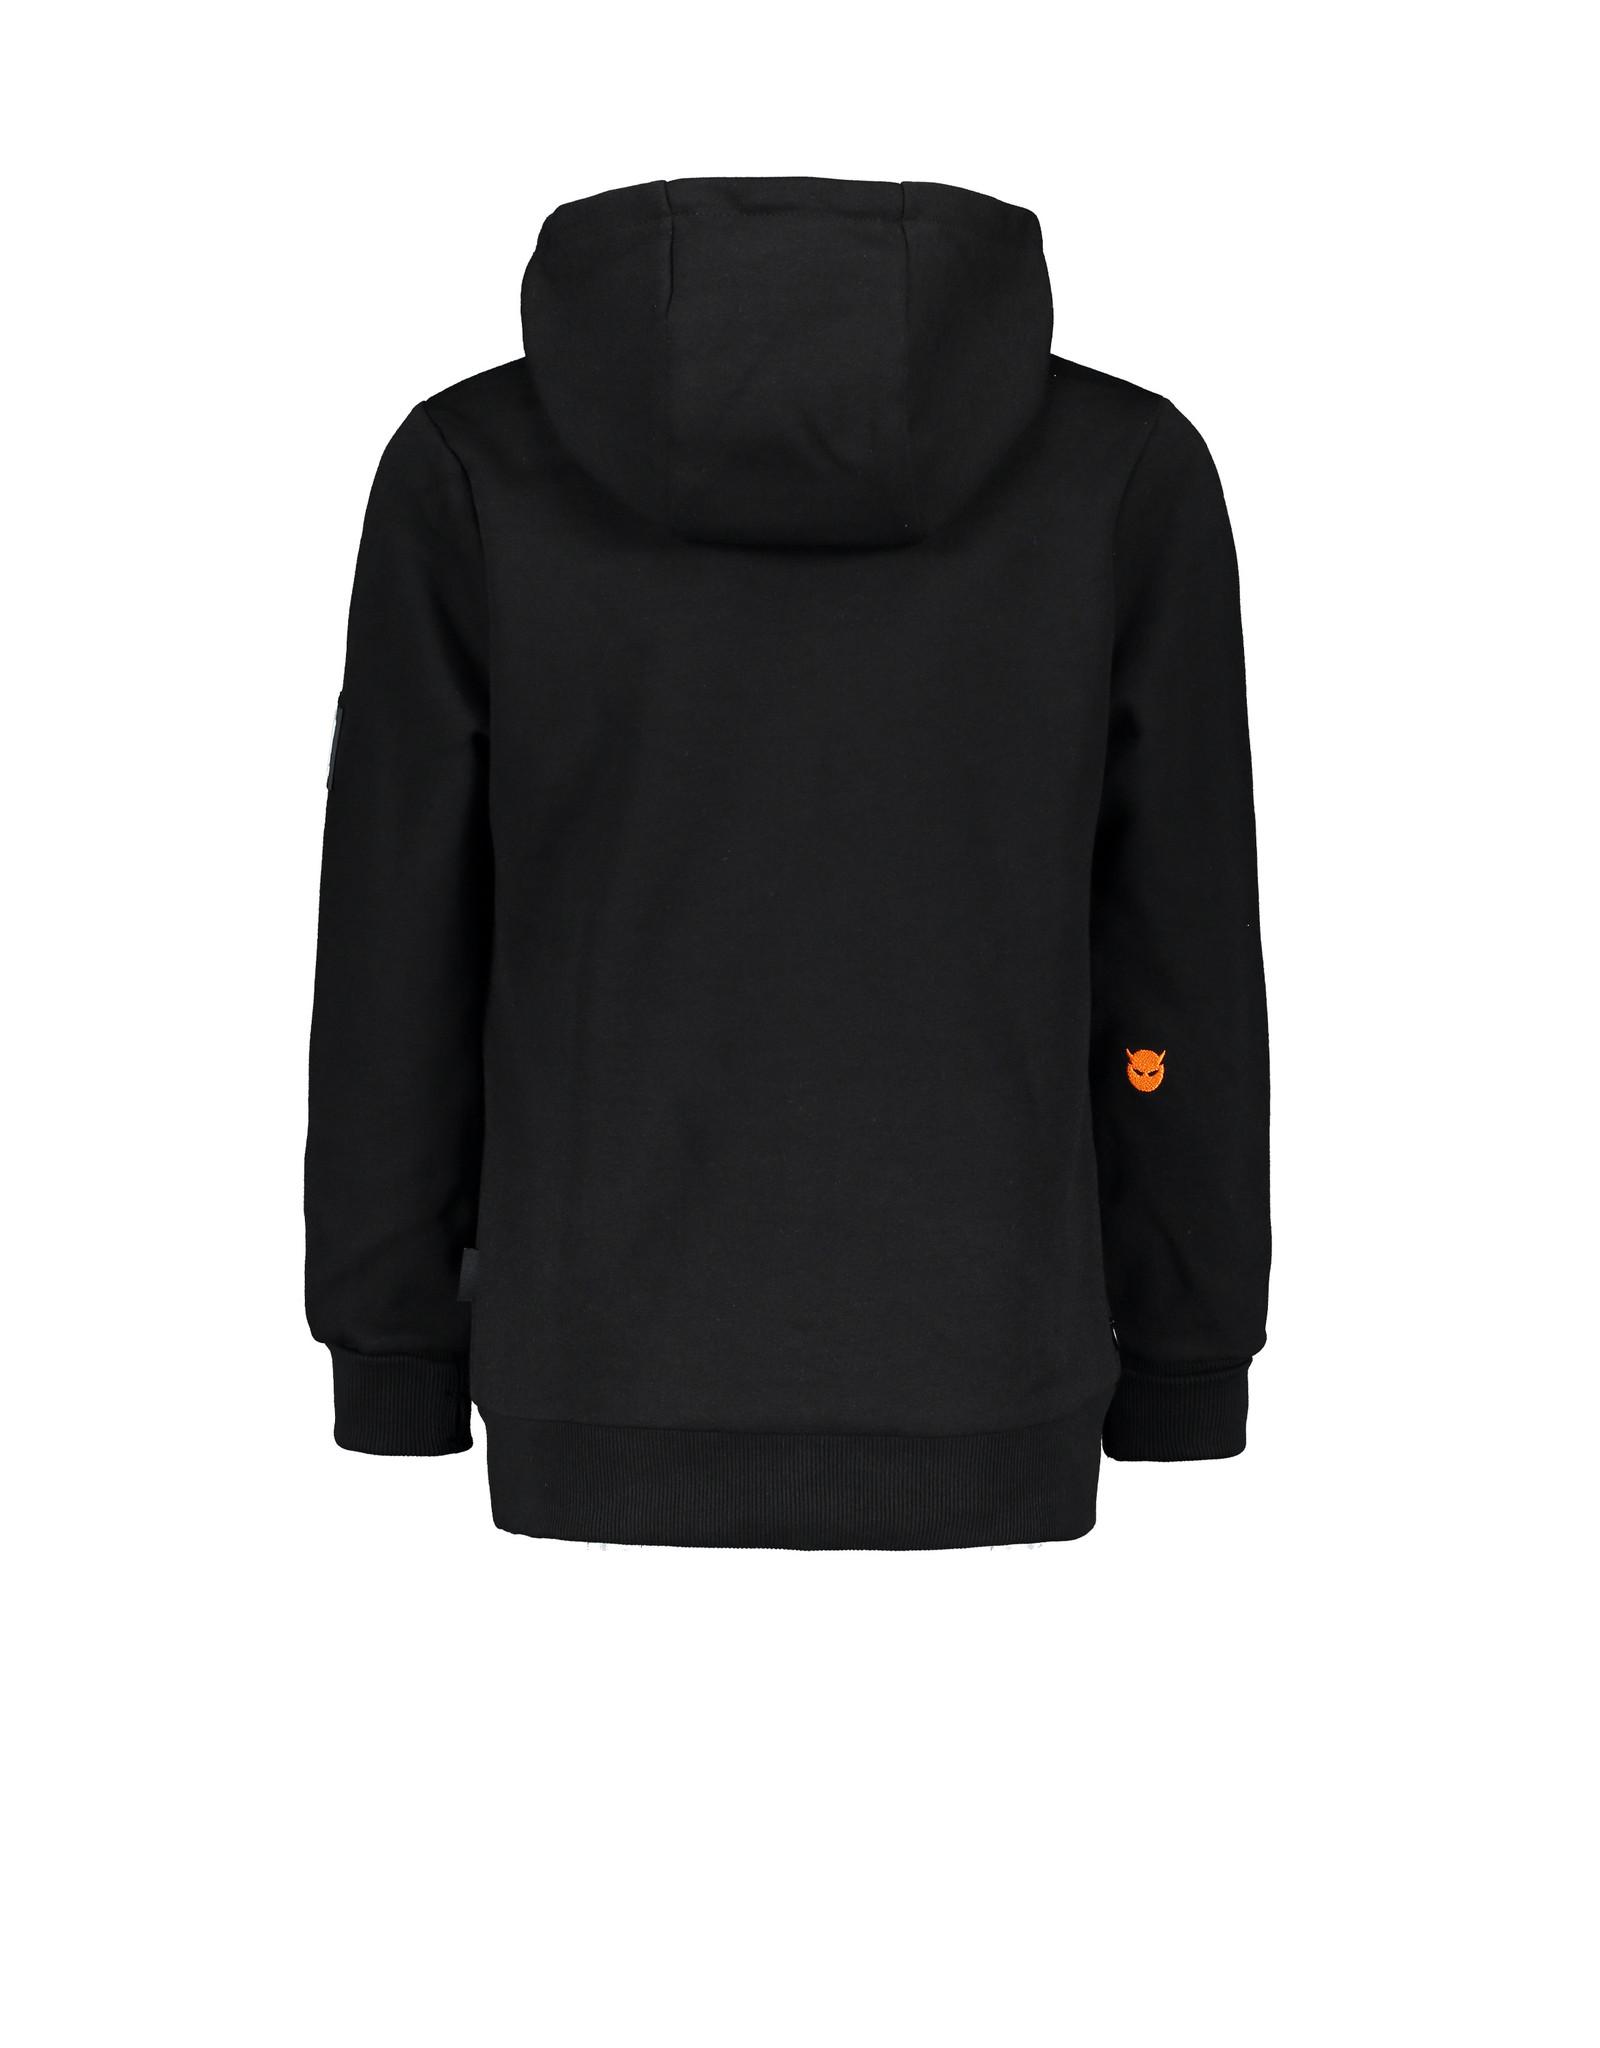 Super Rebel Super Rebel Hooded Sweater pri BLACK